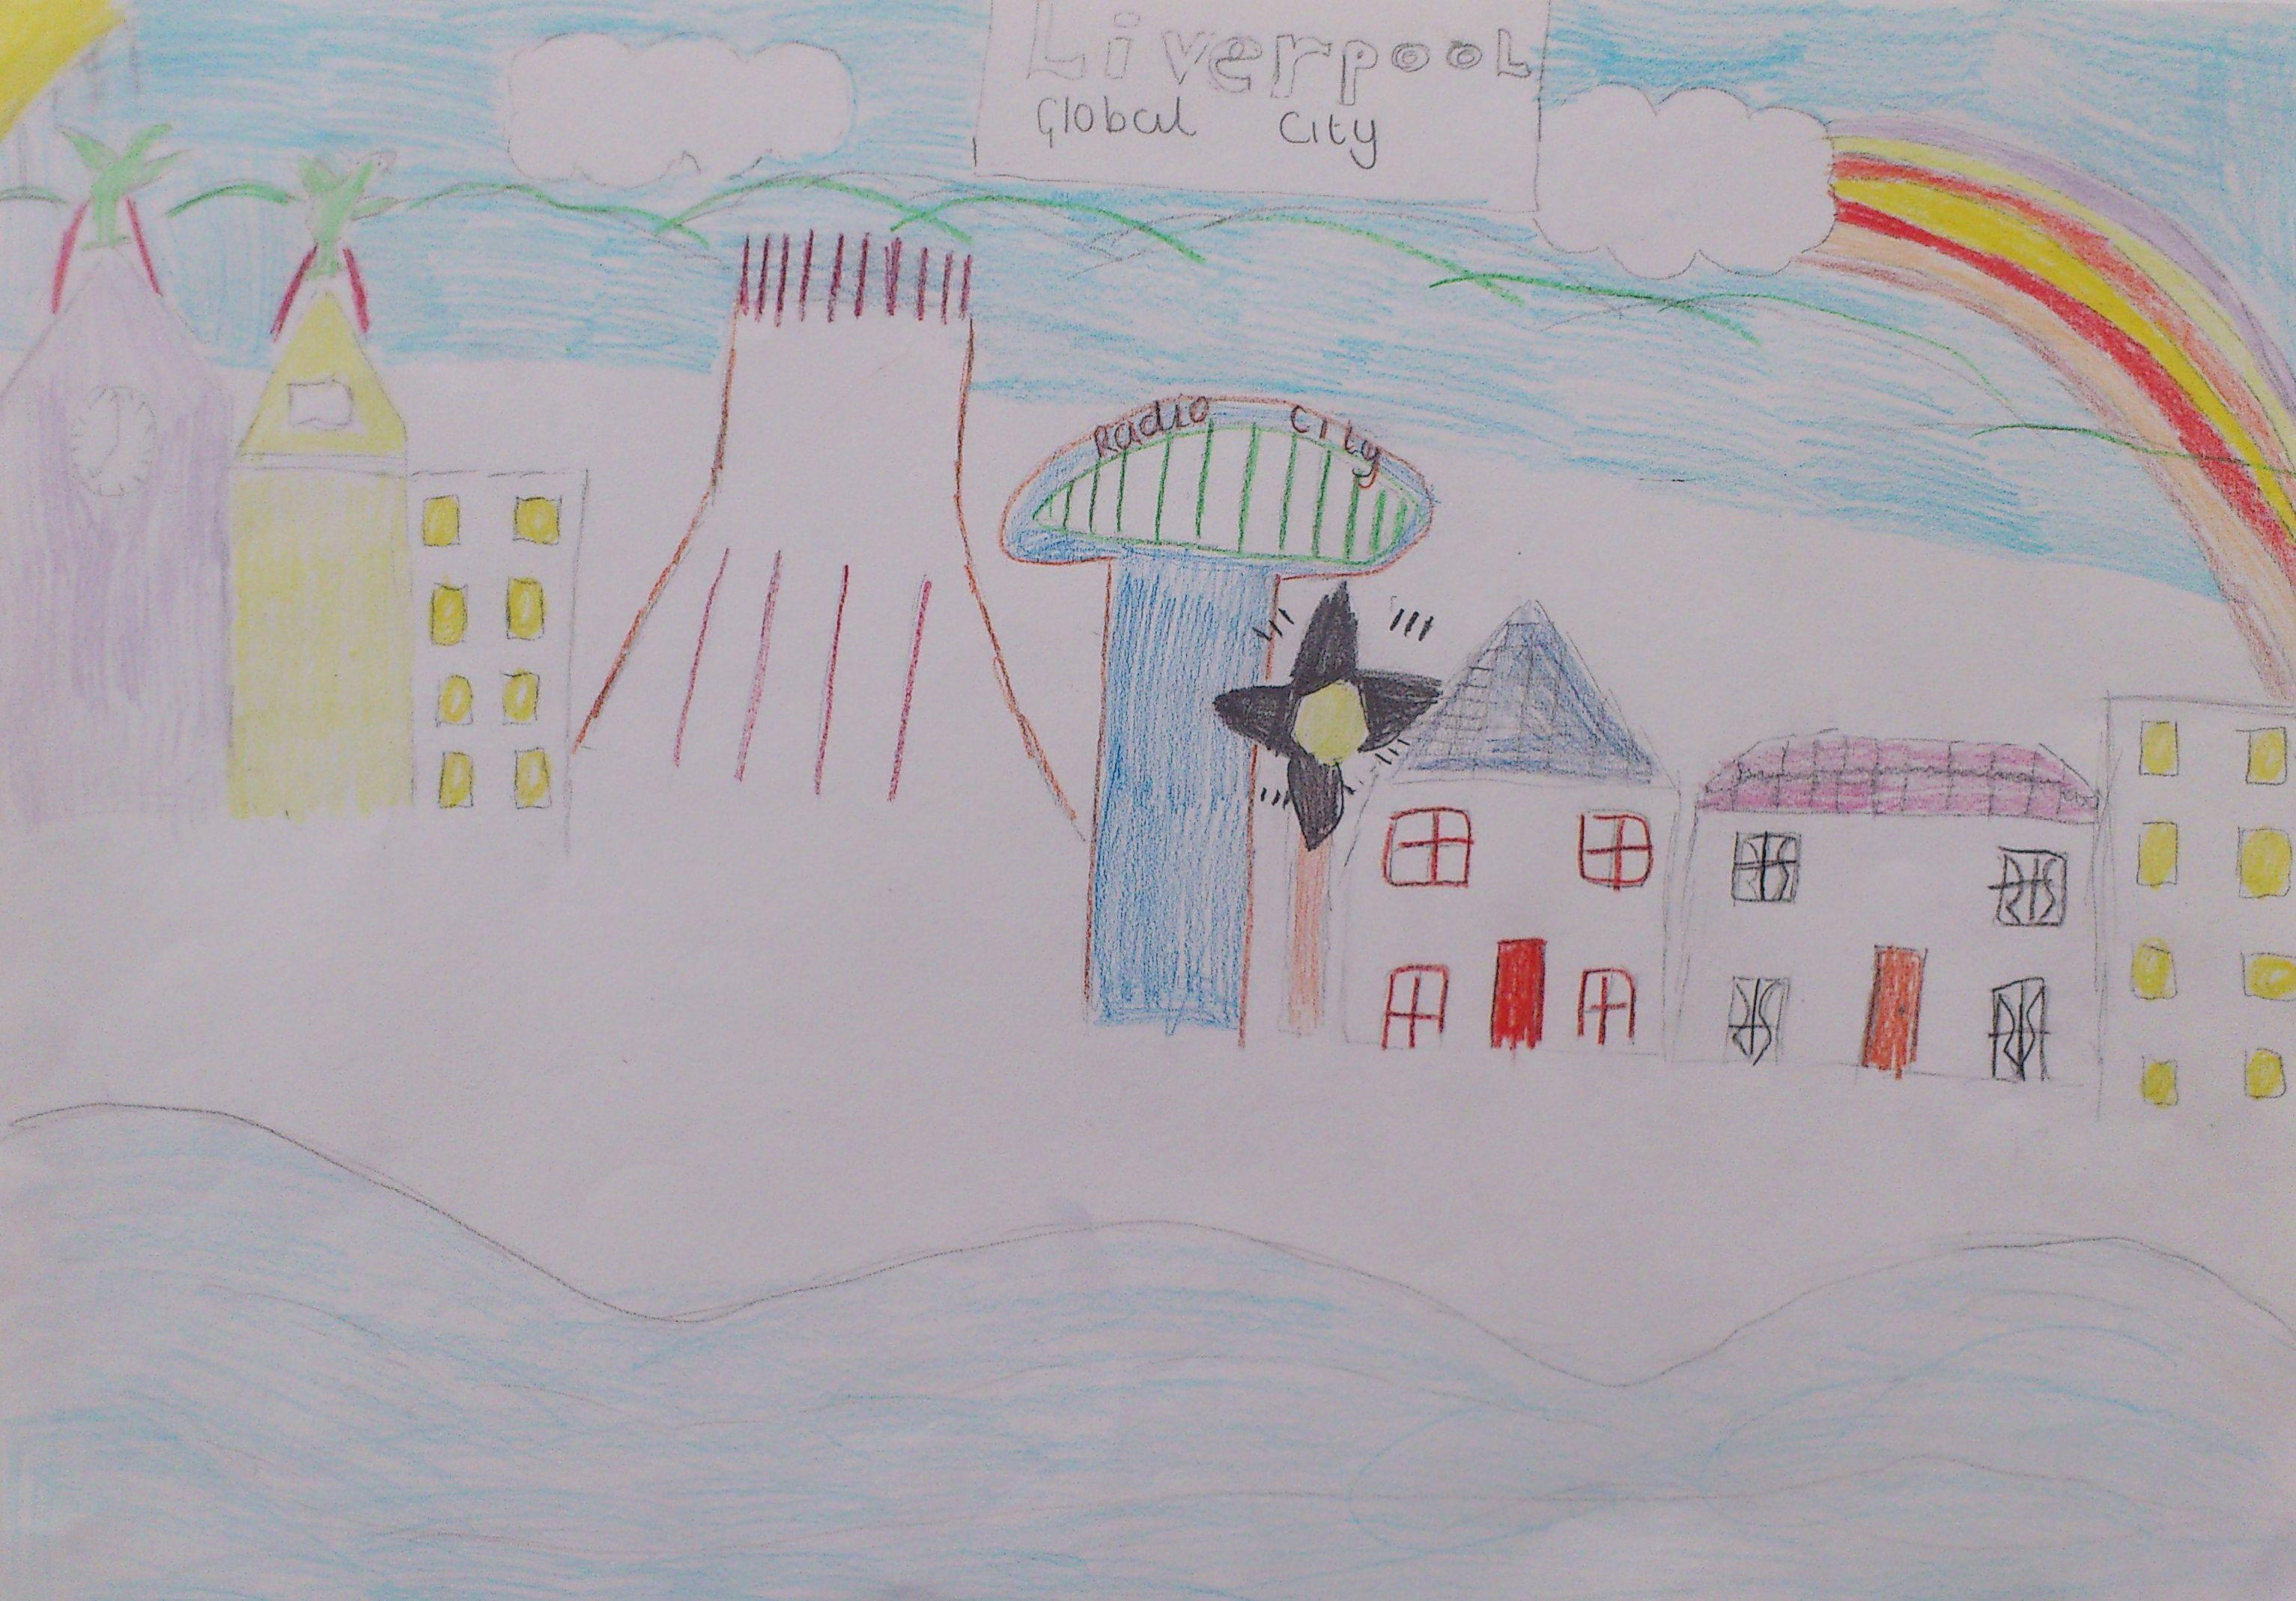 Line Drawing Ks2 : Sophie carroll ks stocktonwood looking outwards ifb mayoral art